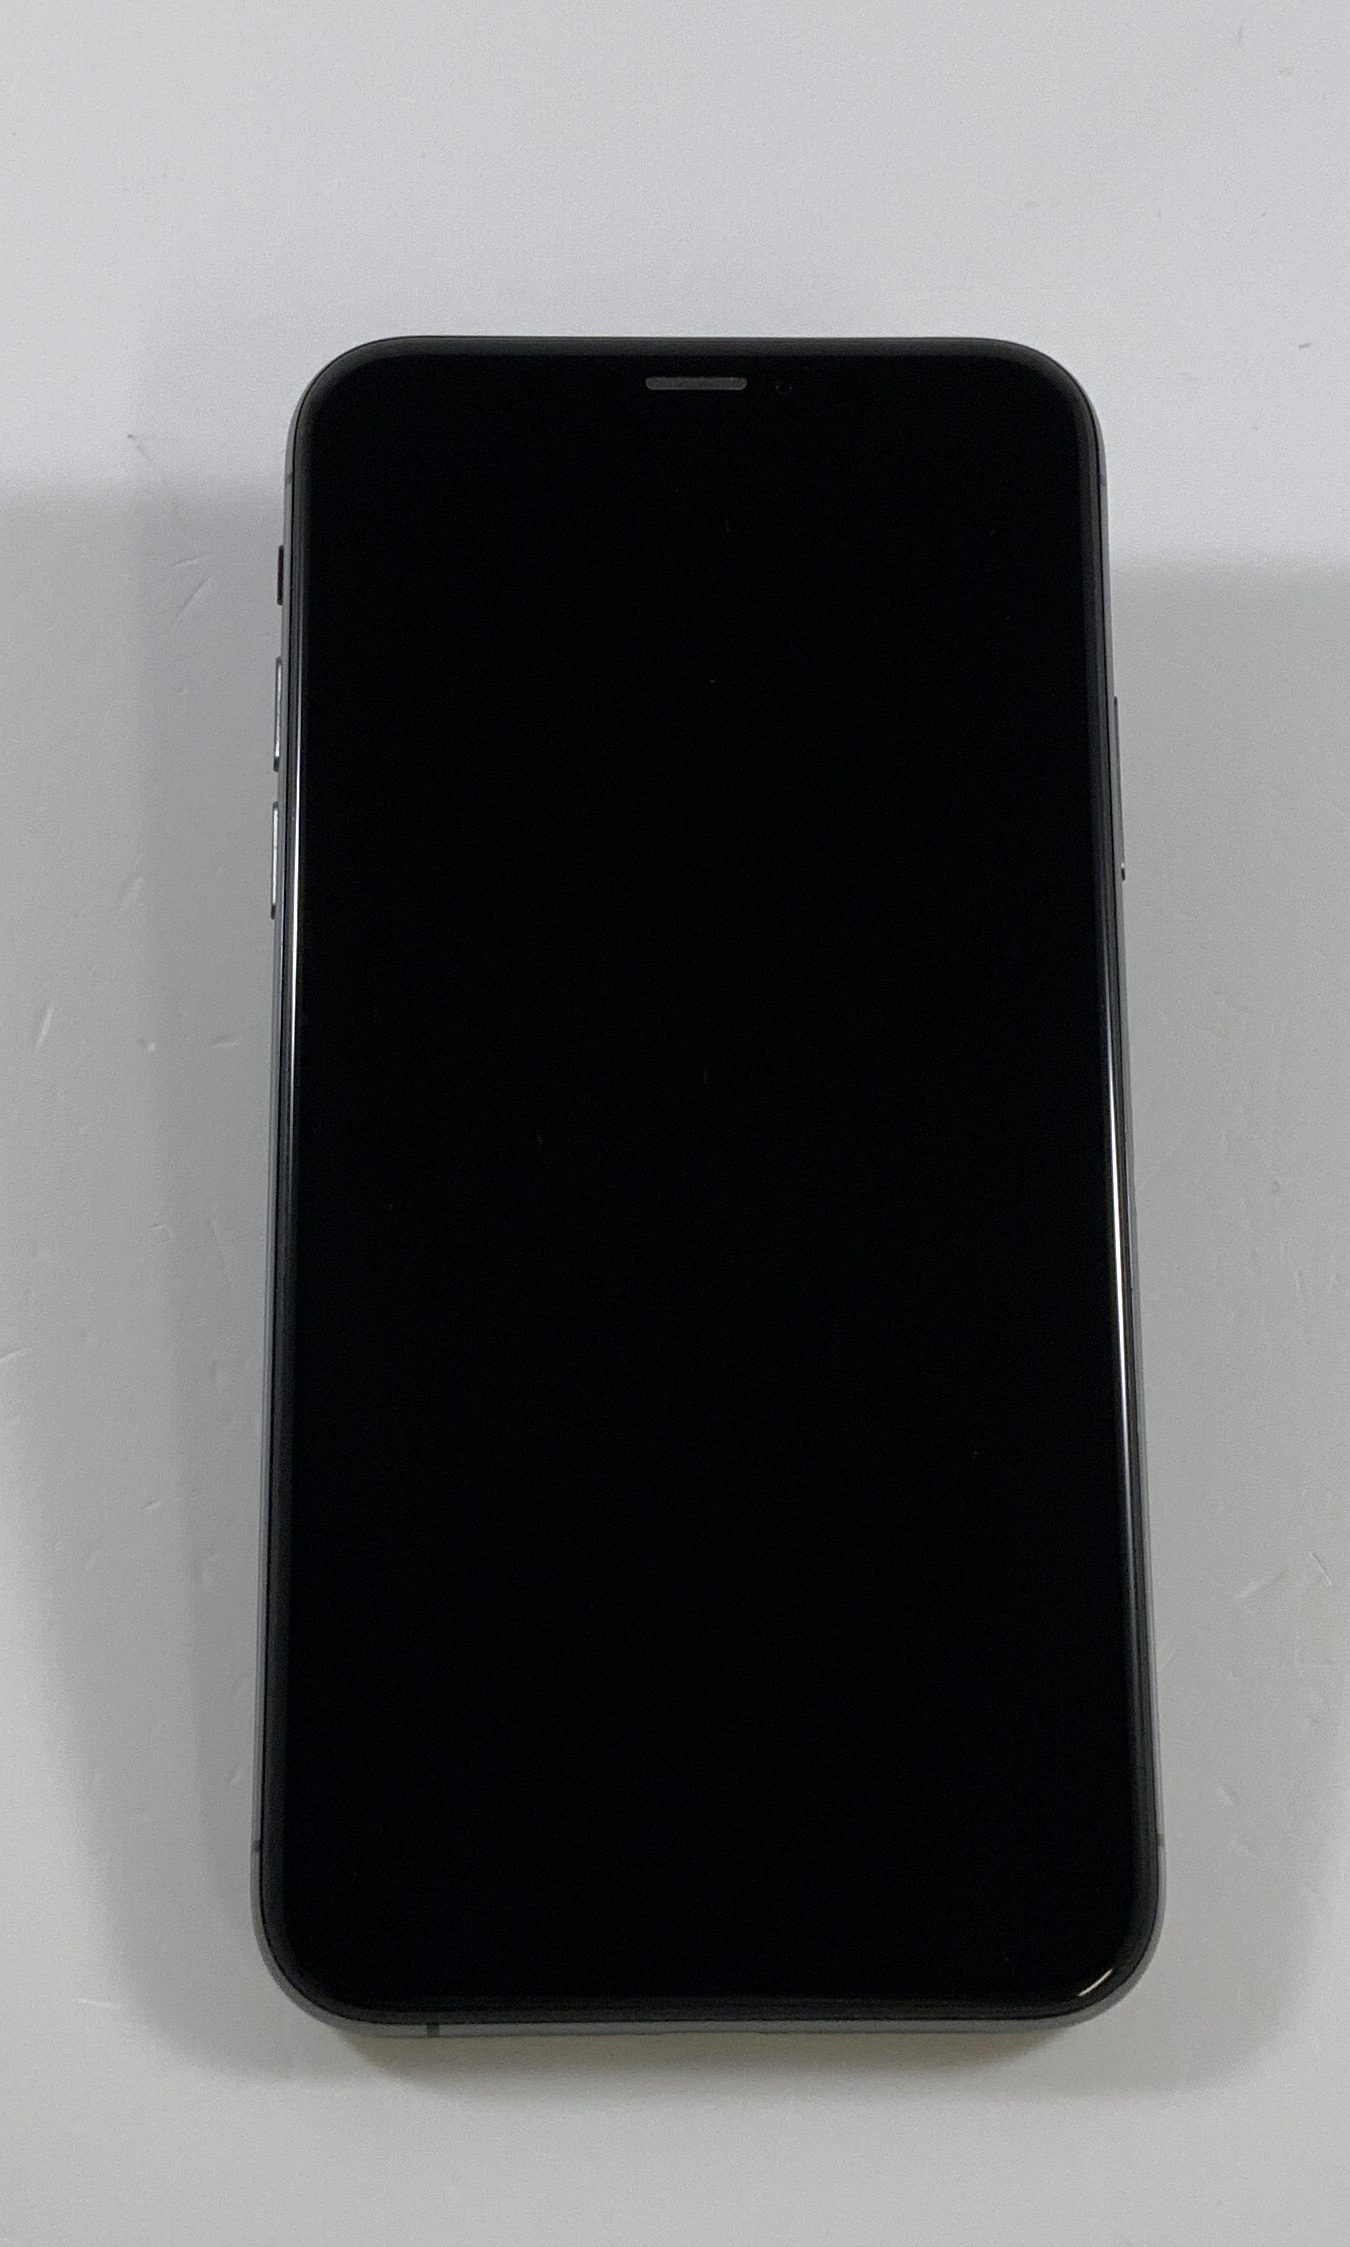 iPhone XS 256GB, 256GB, Space Gray, immagine 1